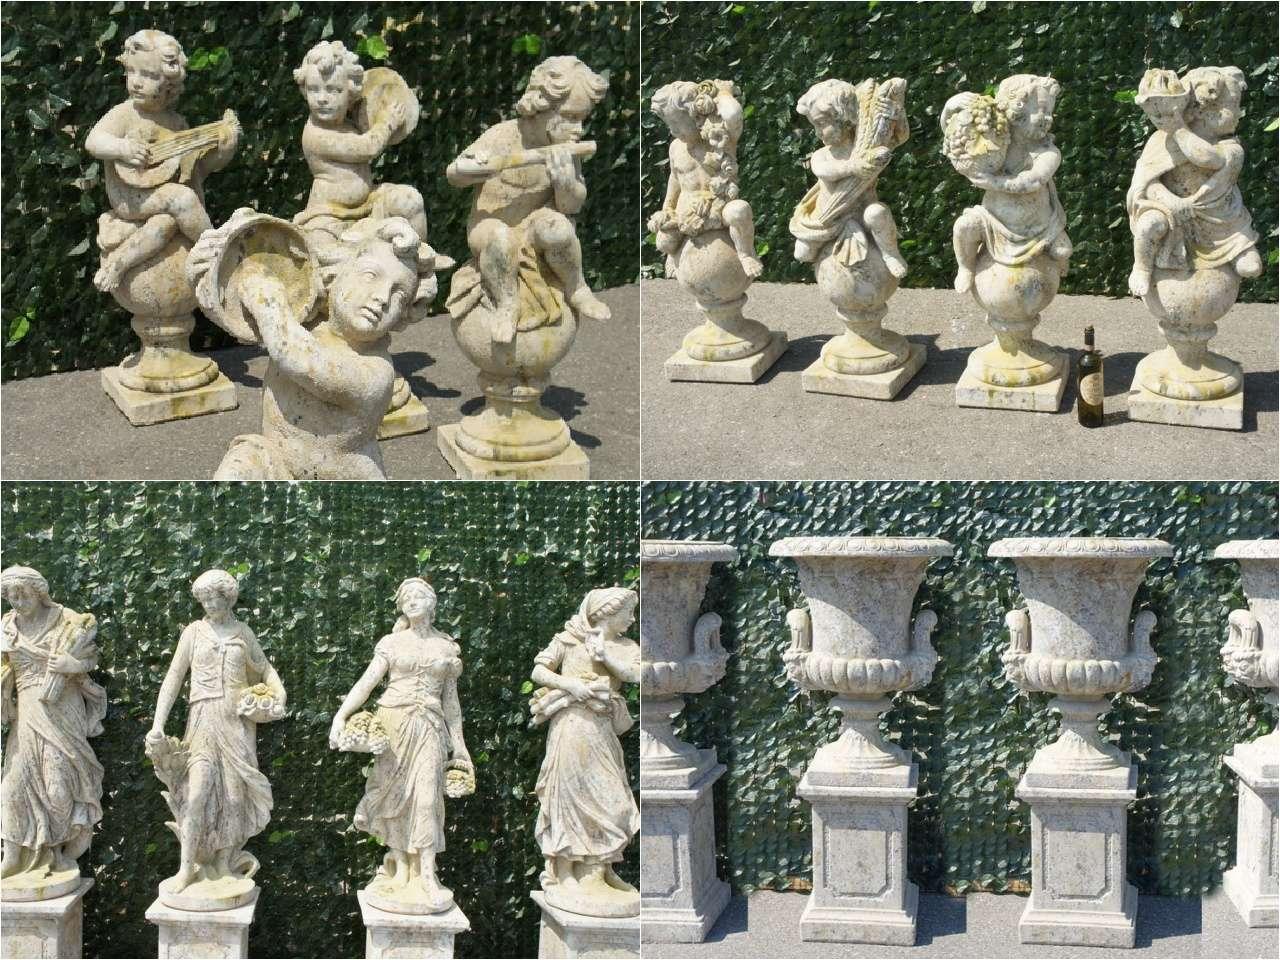 Arredo giardino statue giardino 4 stagioni vasi leoni for Colonne da giardino